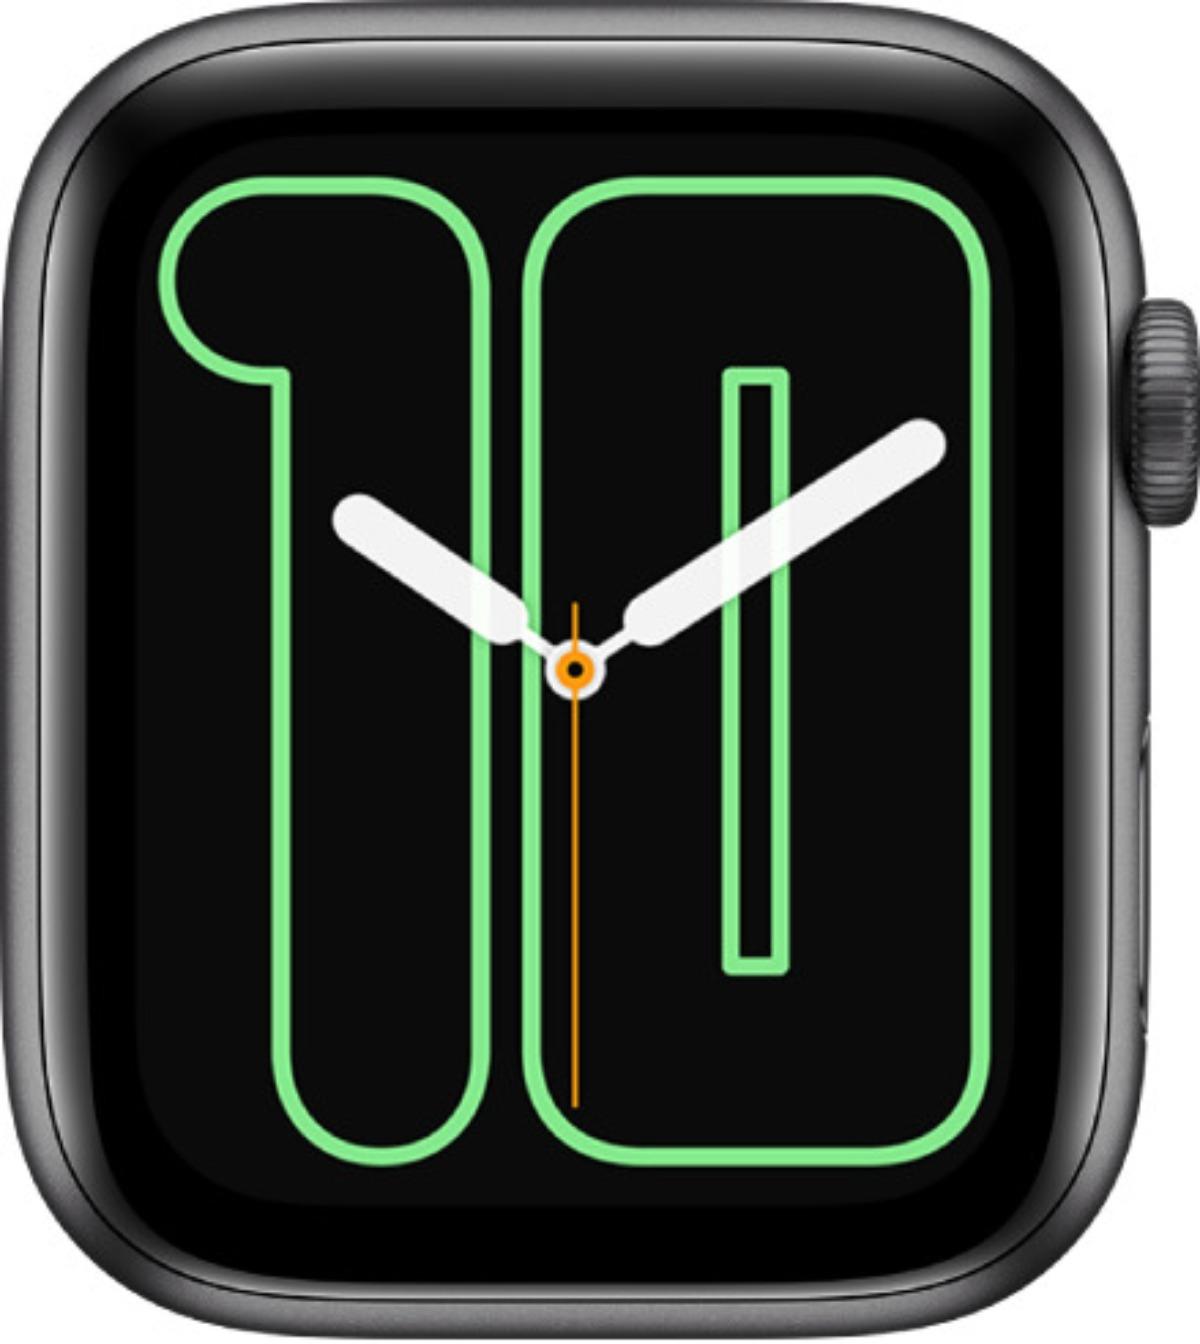 Applewatchのおすすめ文字盤アプリ4選を紹介 ブランドに変更する方法も Richwatch